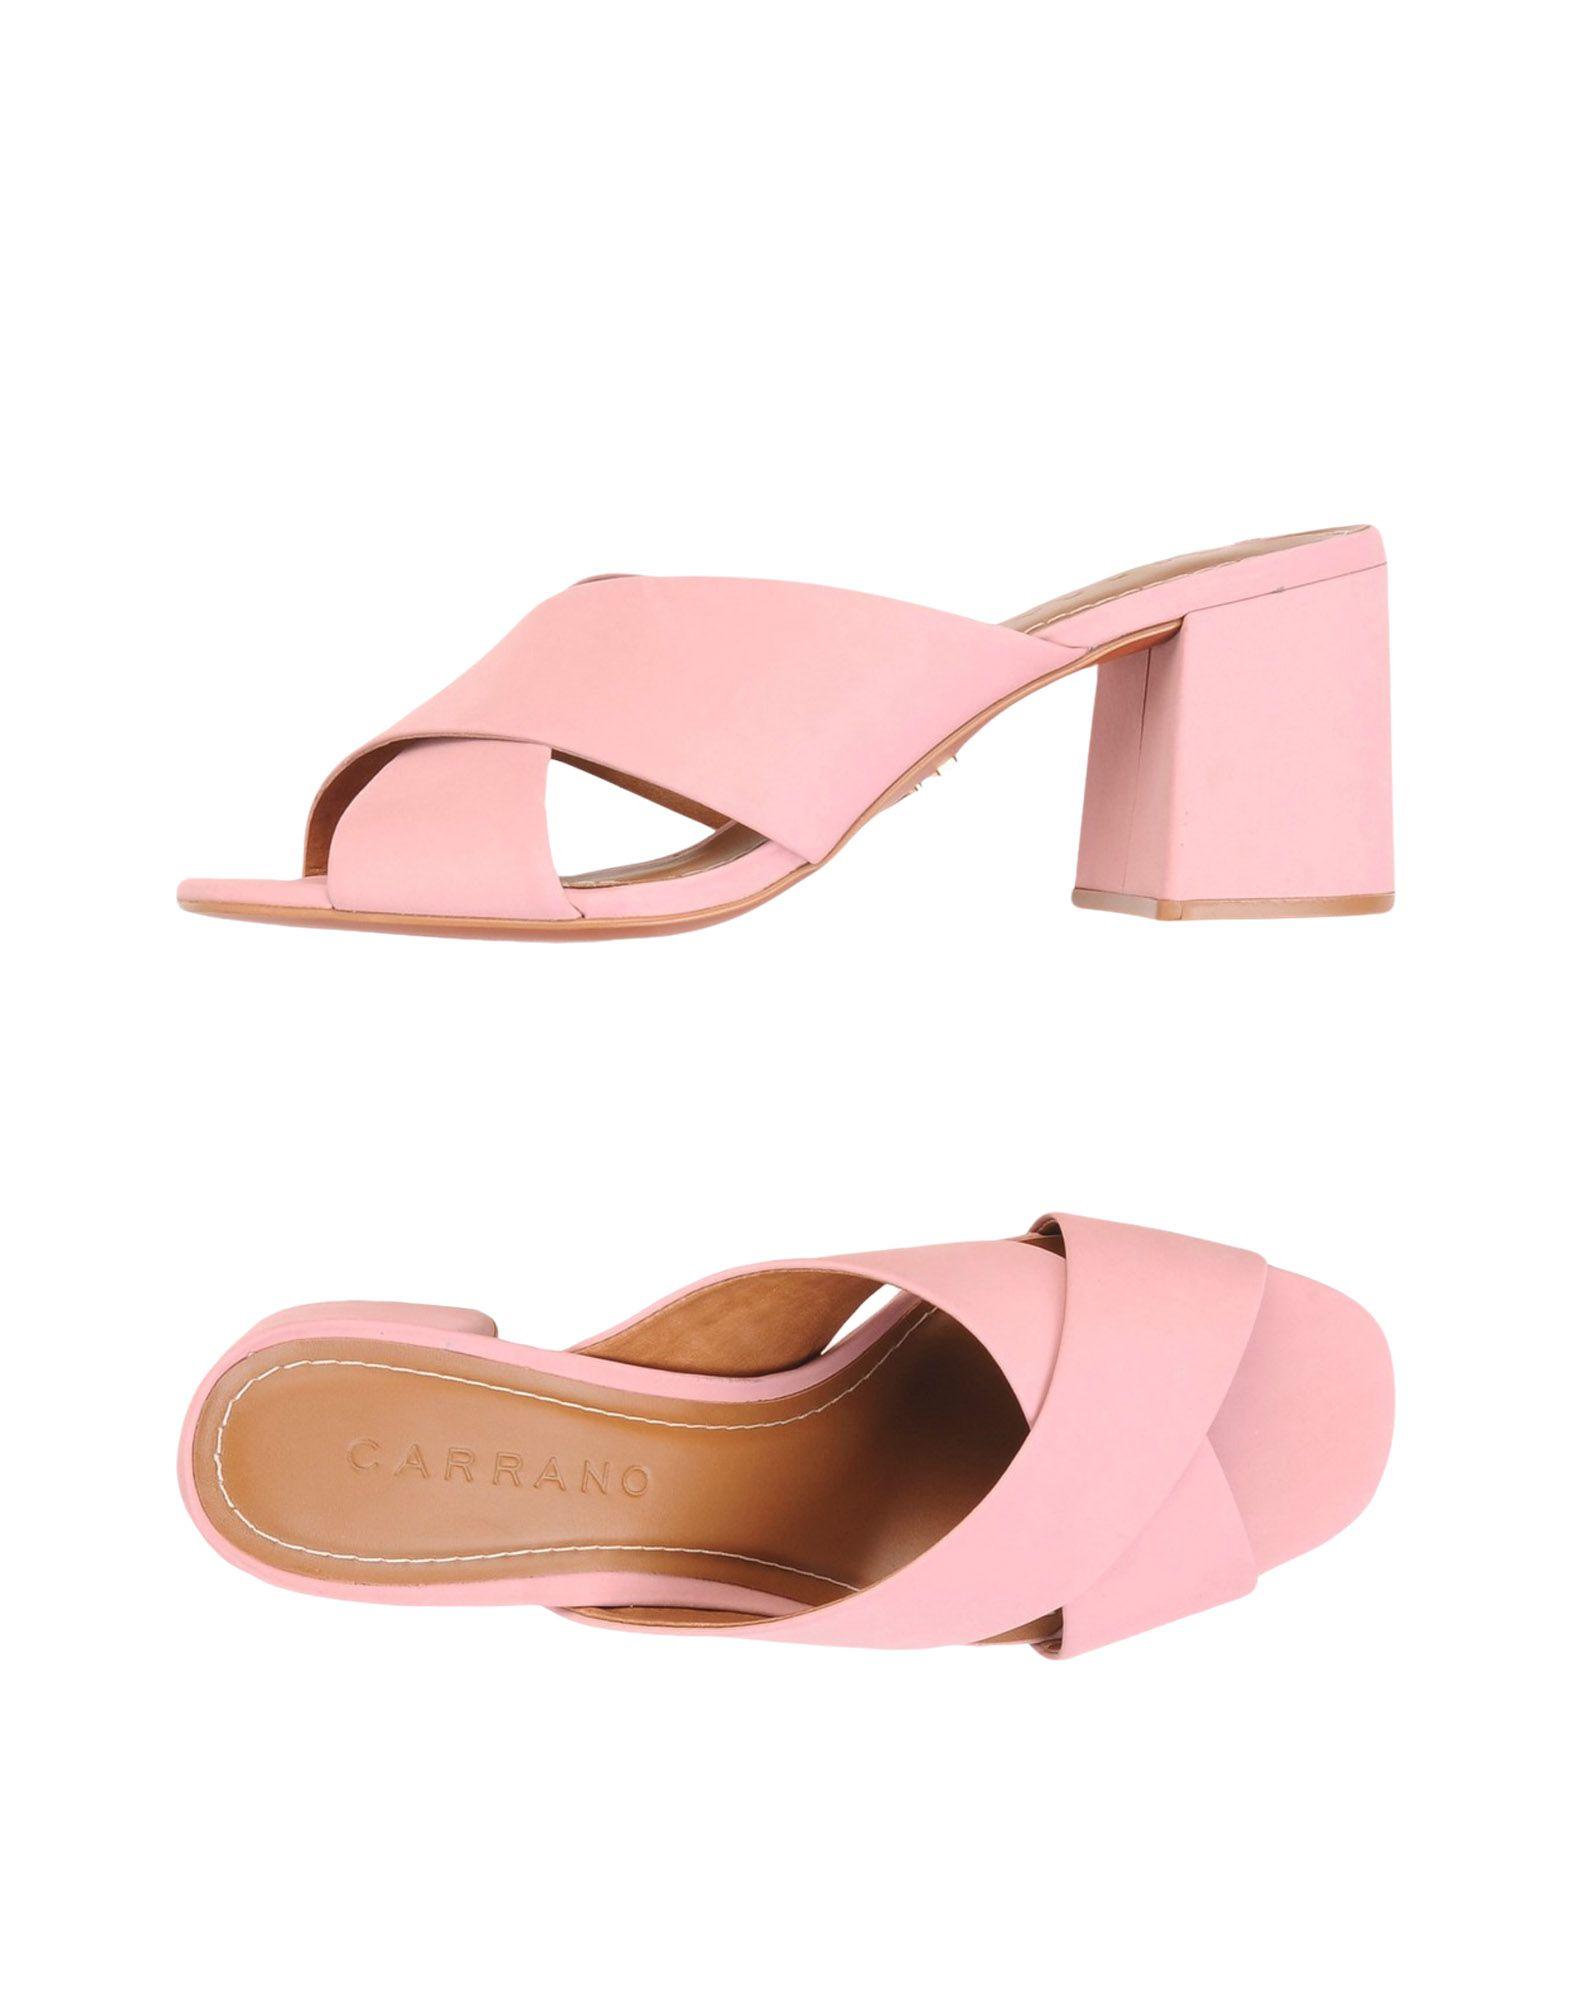 Sandali Carrano Slippers - Donna - 11456672HM